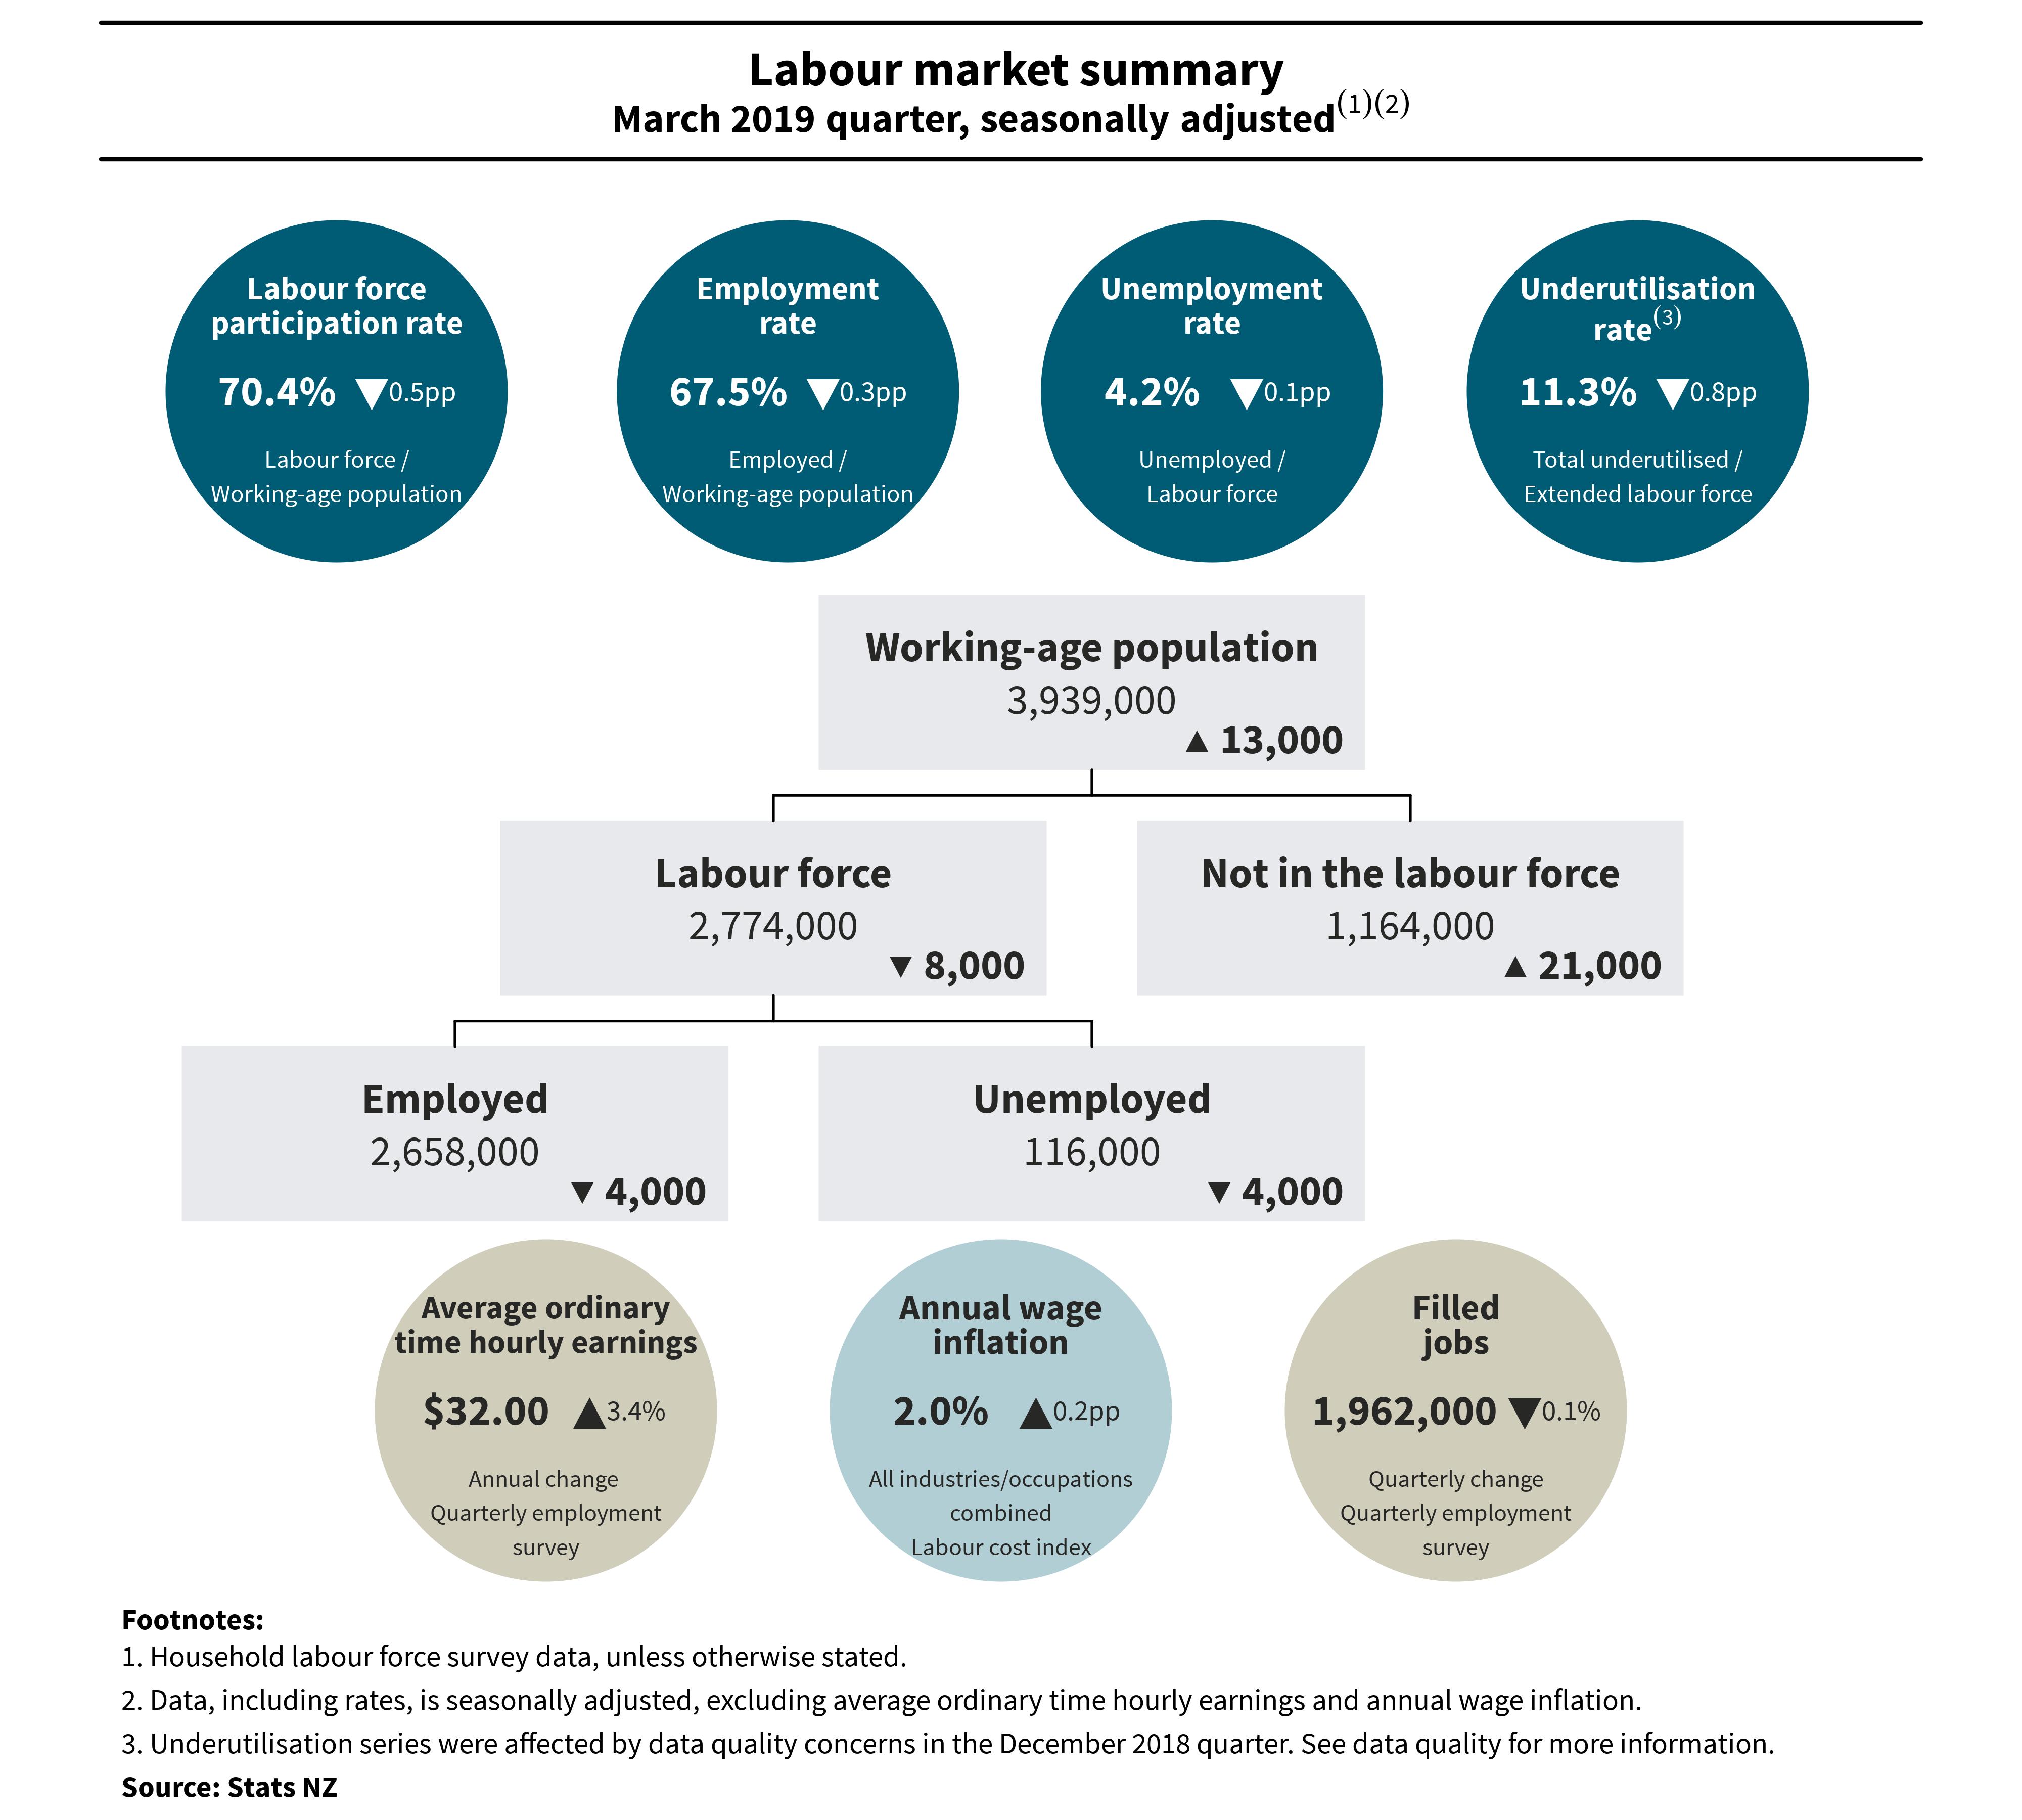 Diagram shows labour market summary, March 2019 quarter, seasonally adjusted